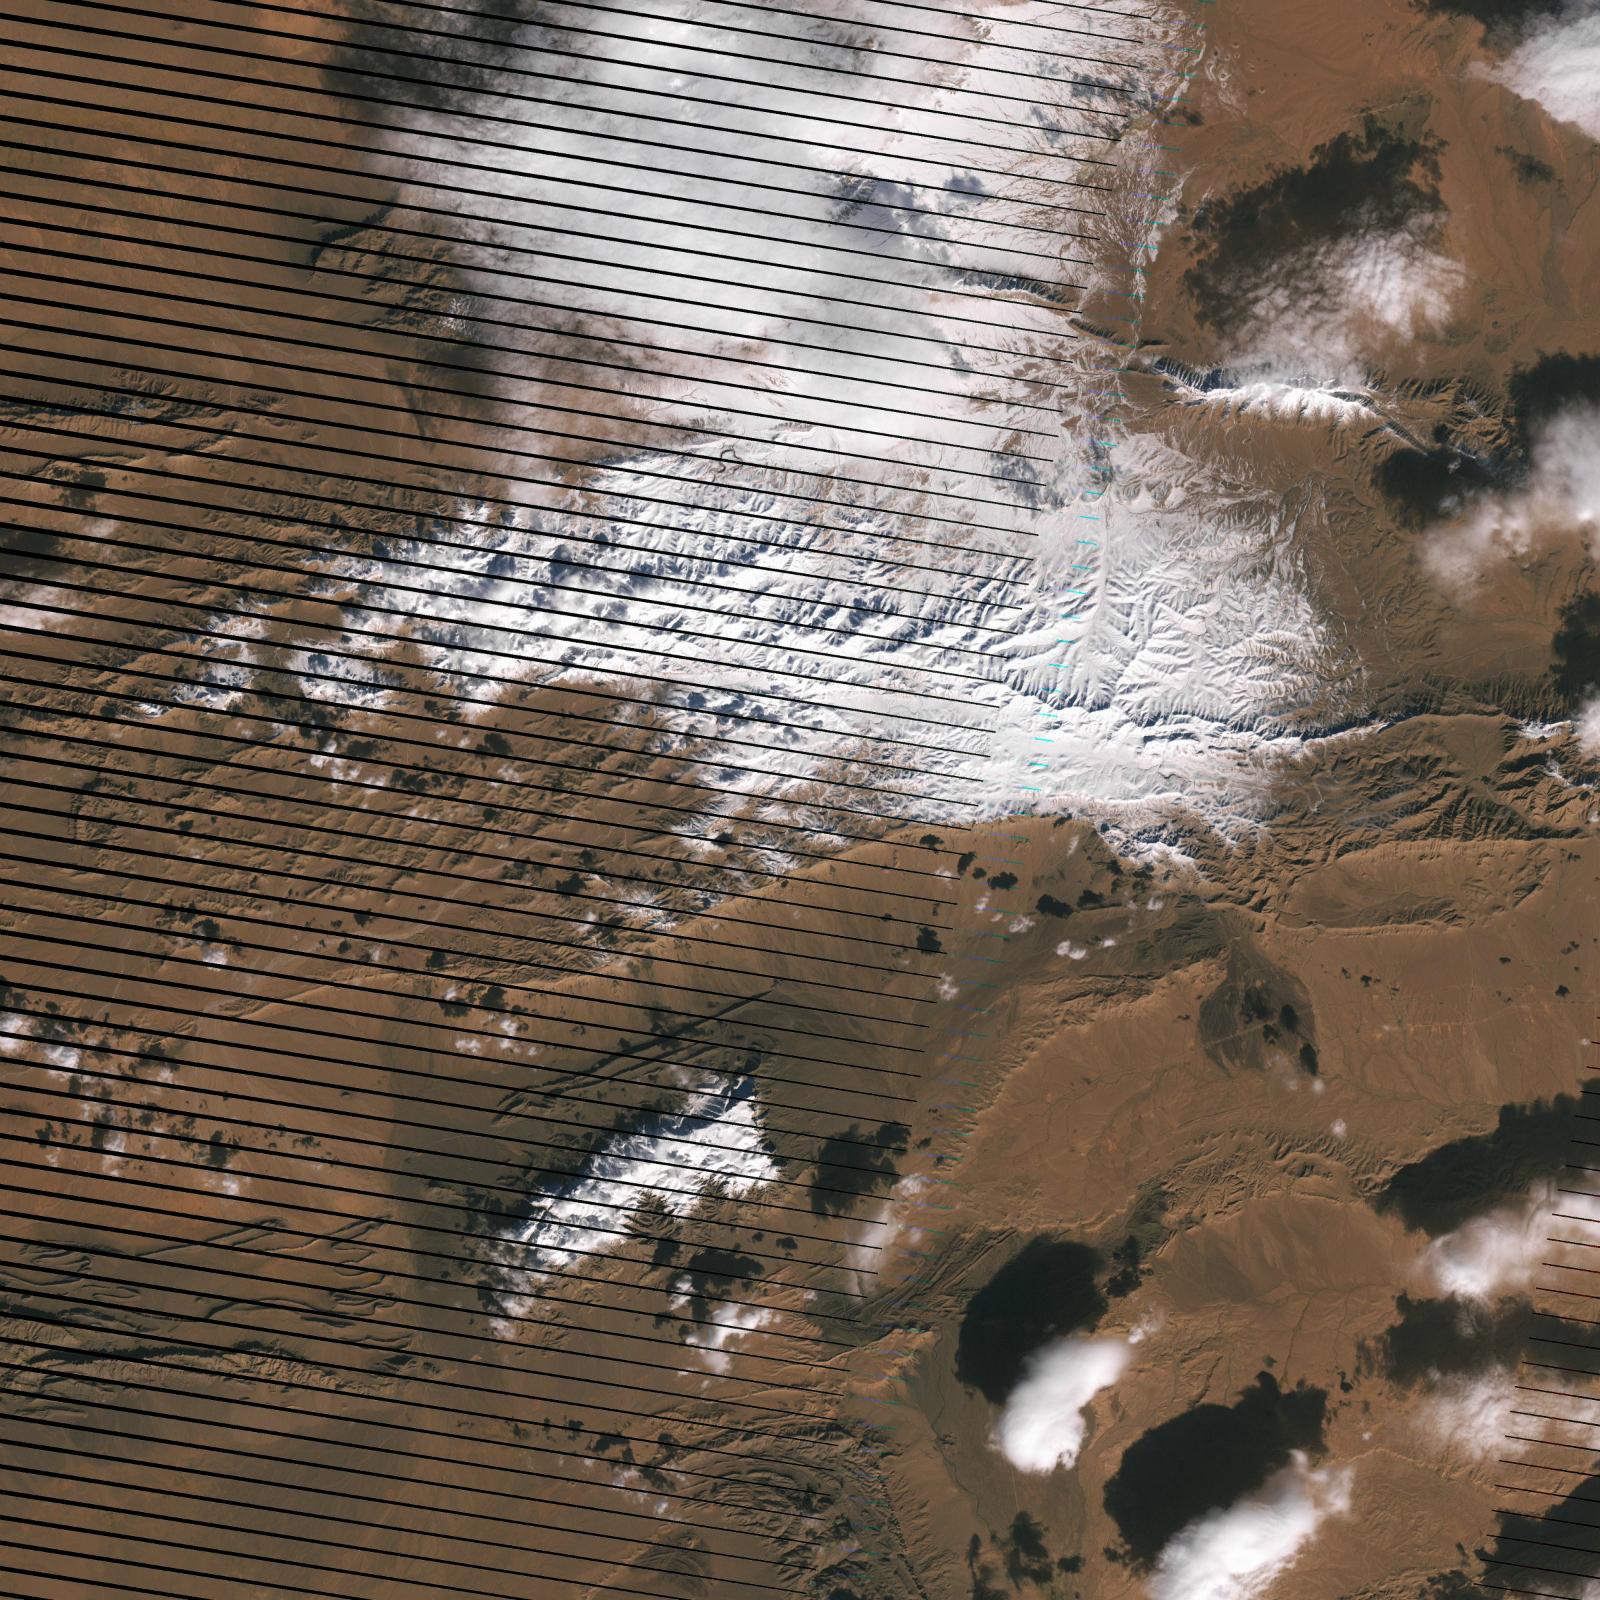 sahara-snow-photos-nasa-2